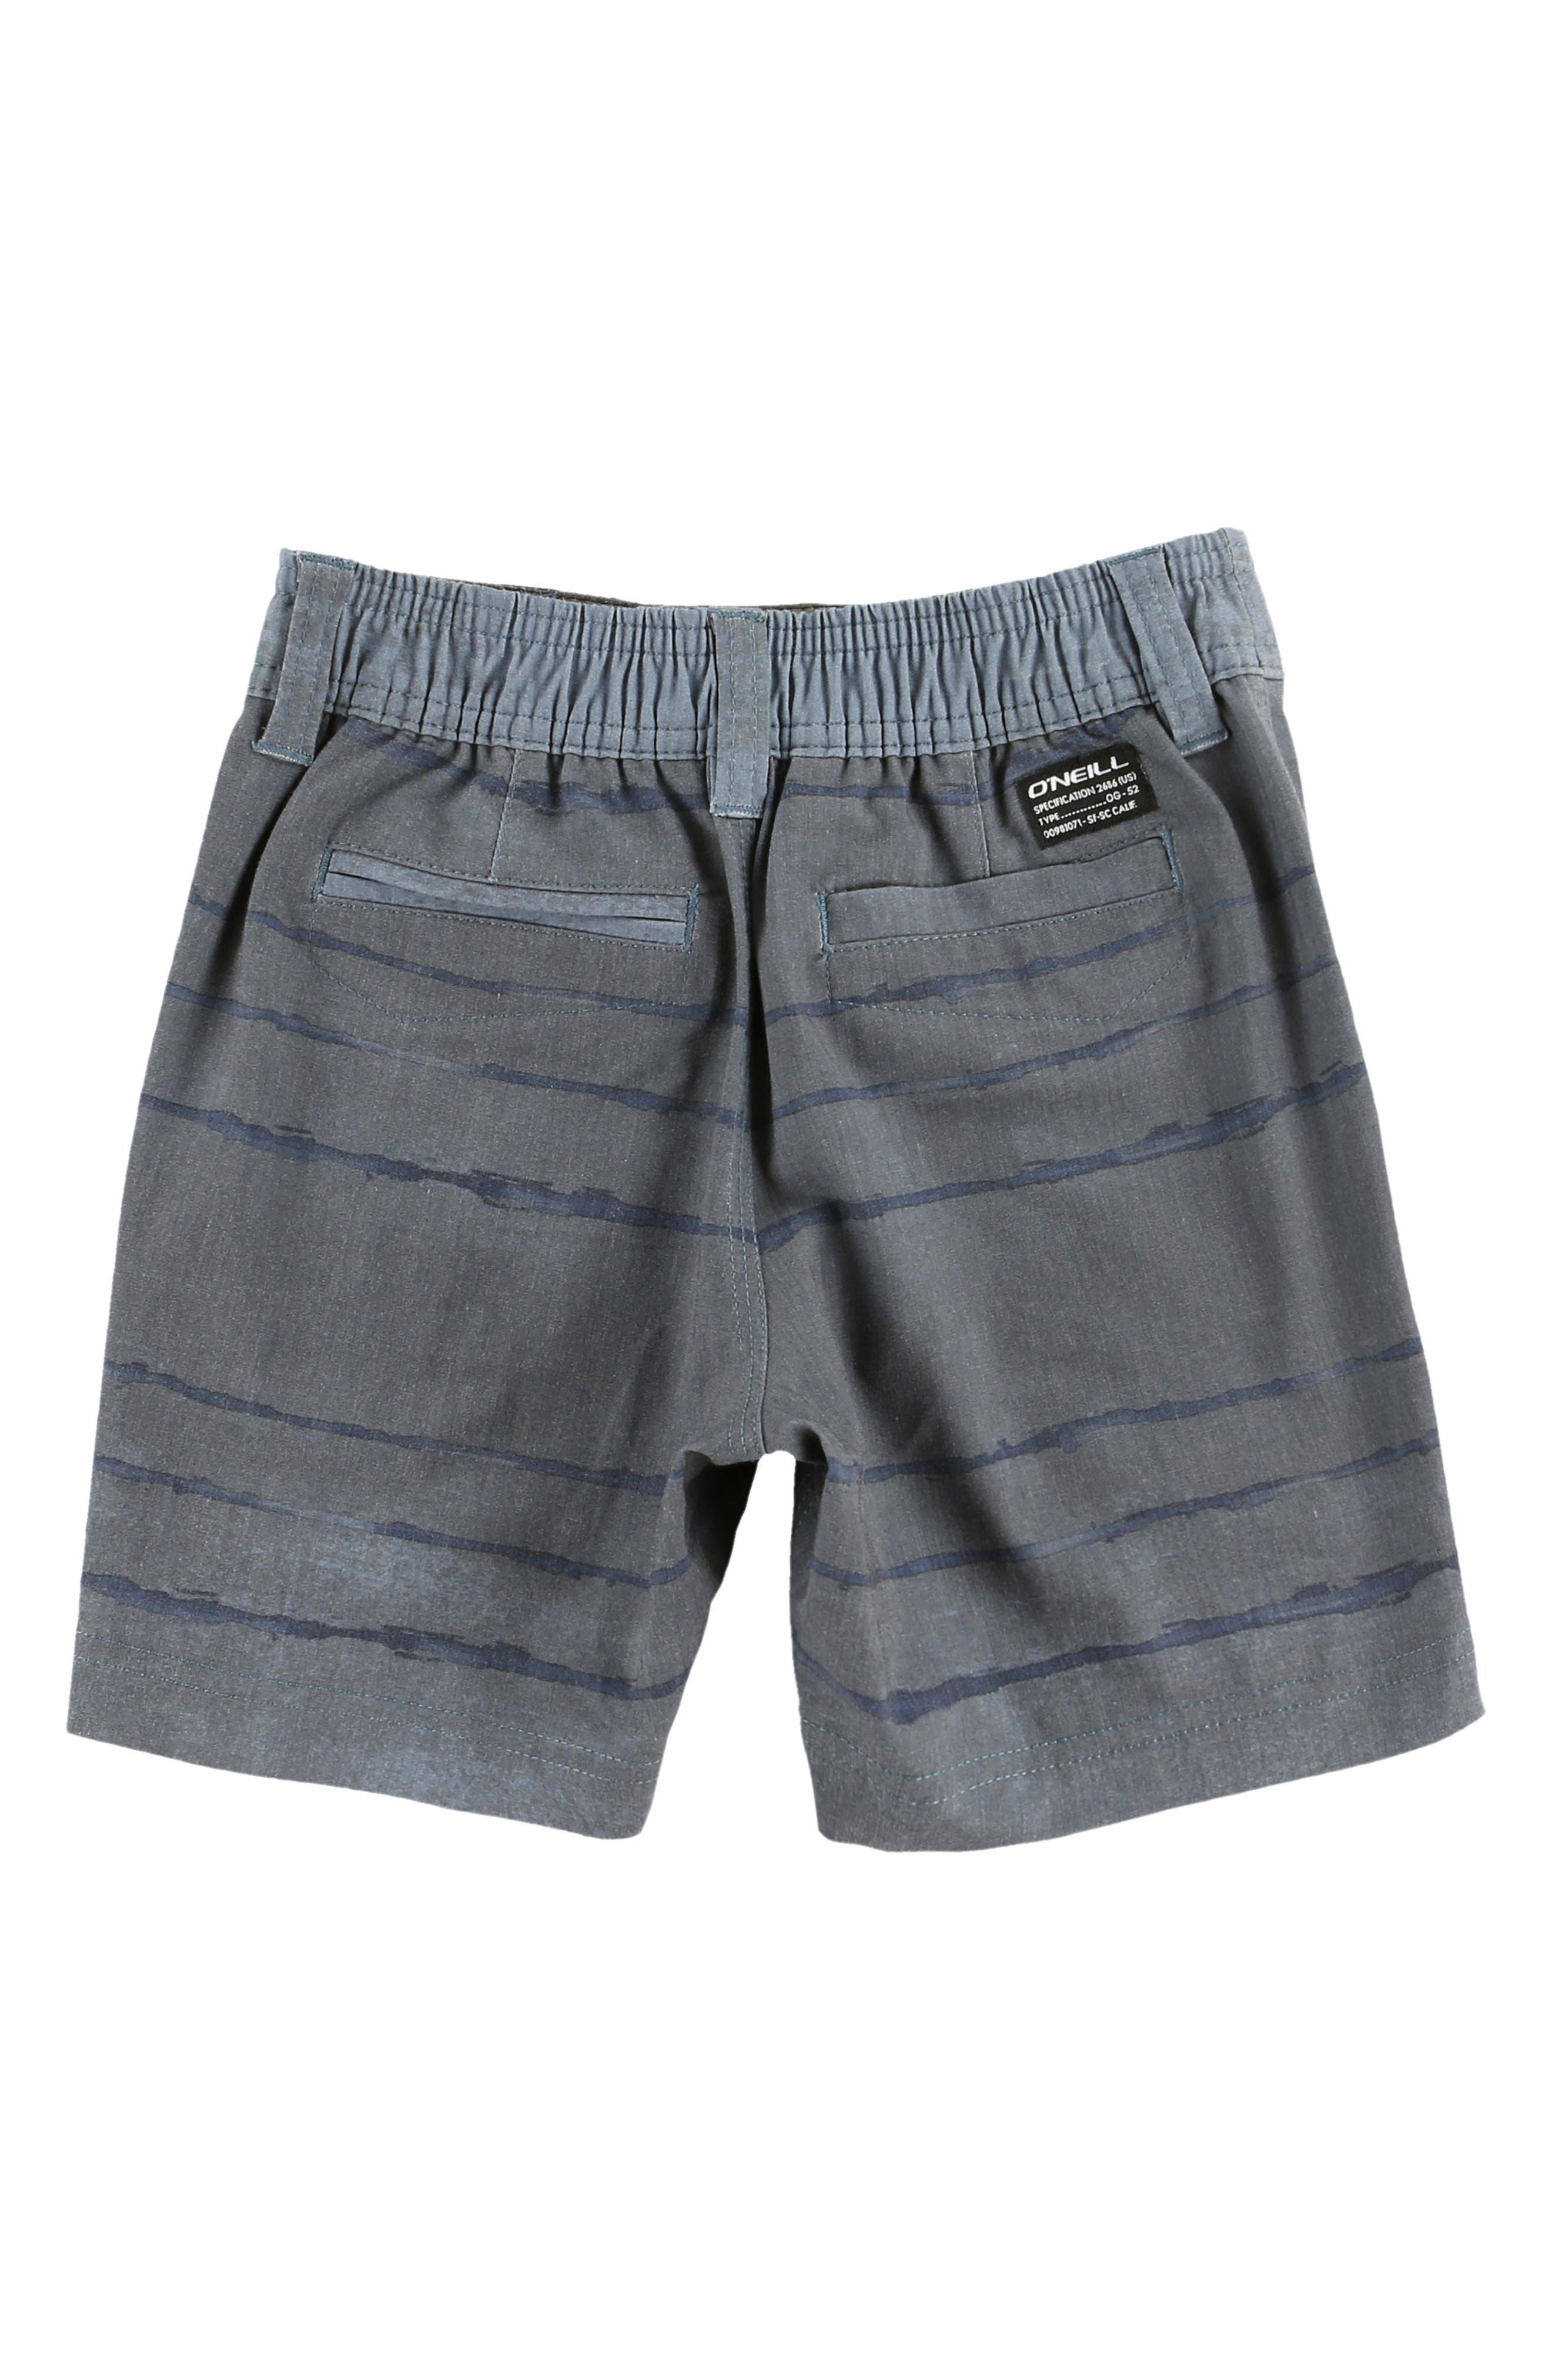 Tye Striper Hybrid Shorts,                             Alternate thumbnail 2, color,                             DUST BLUE